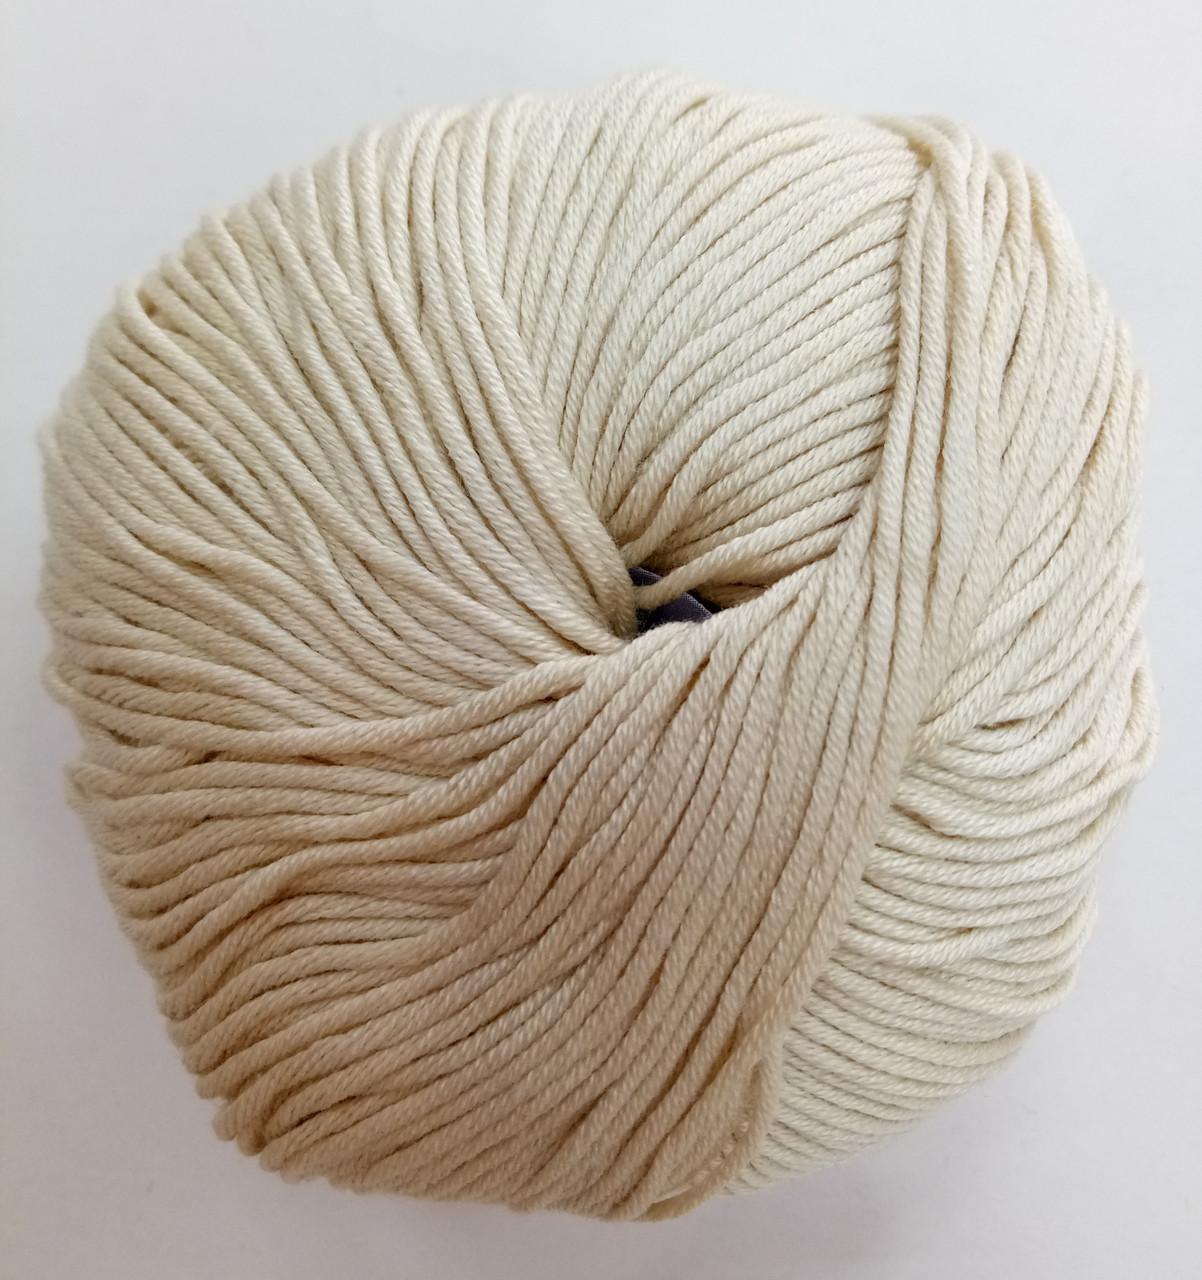 Пряжа для вязания Эджитто TITAN WOOL крем 2140